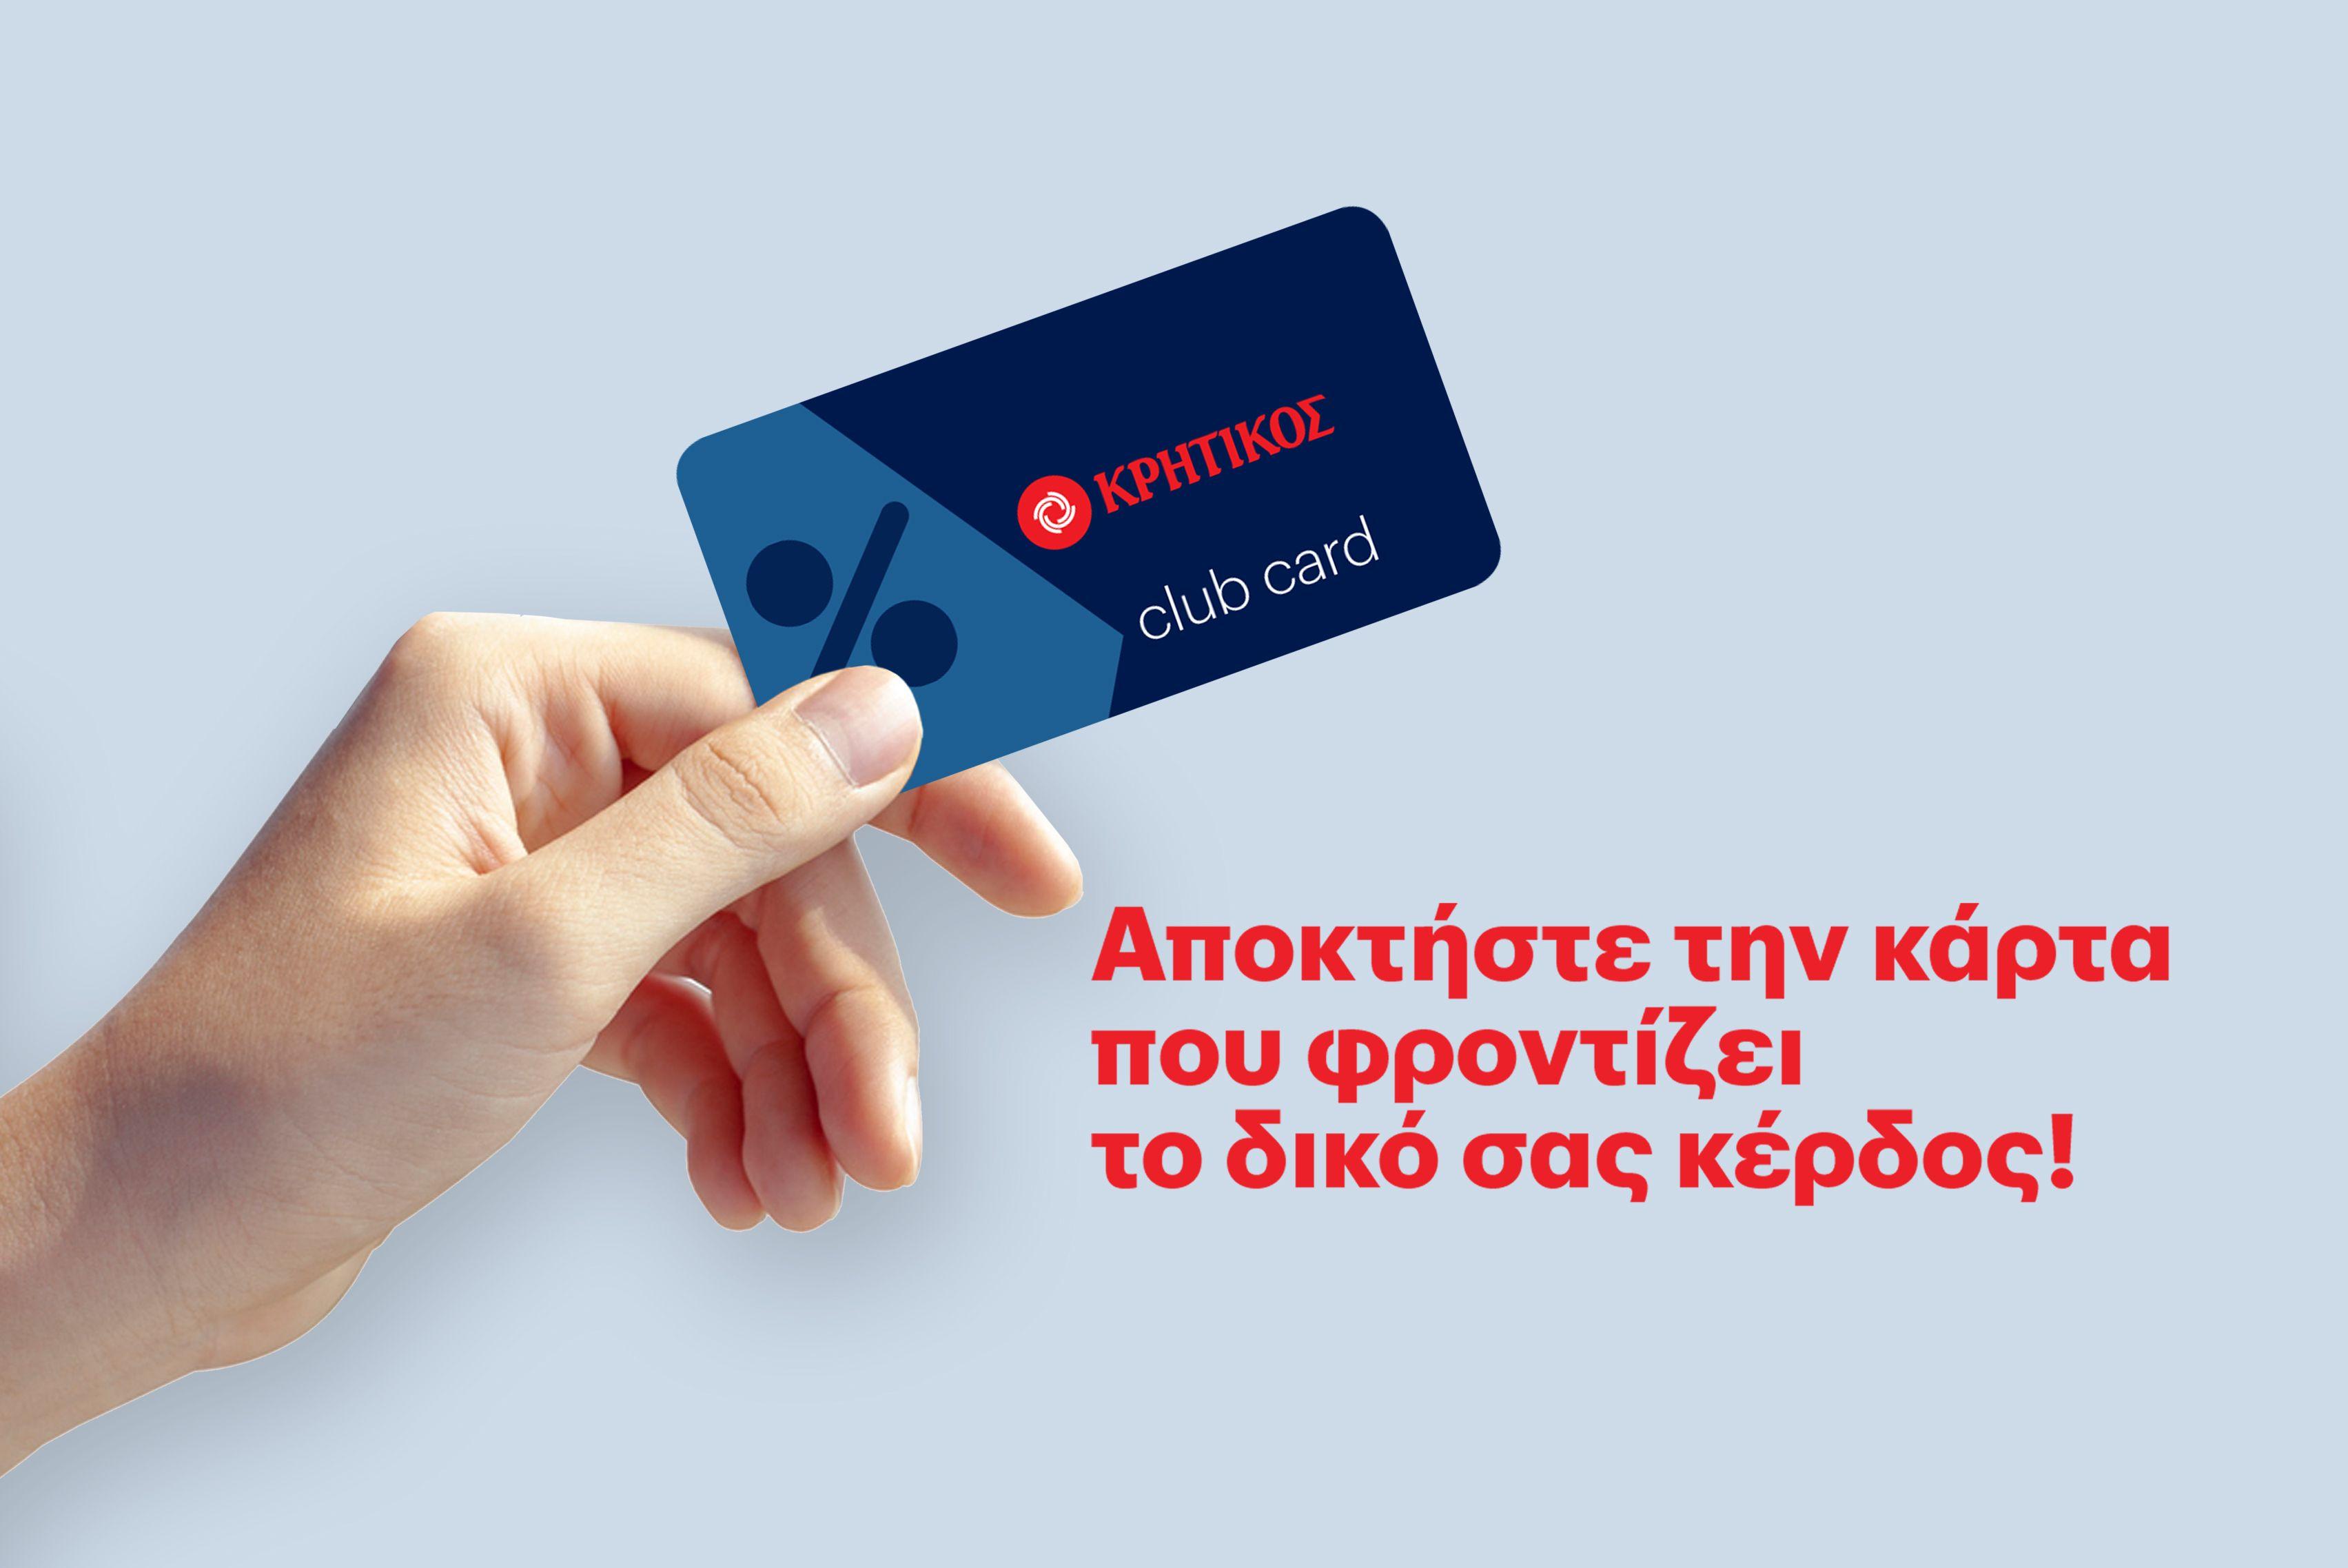 Card cap